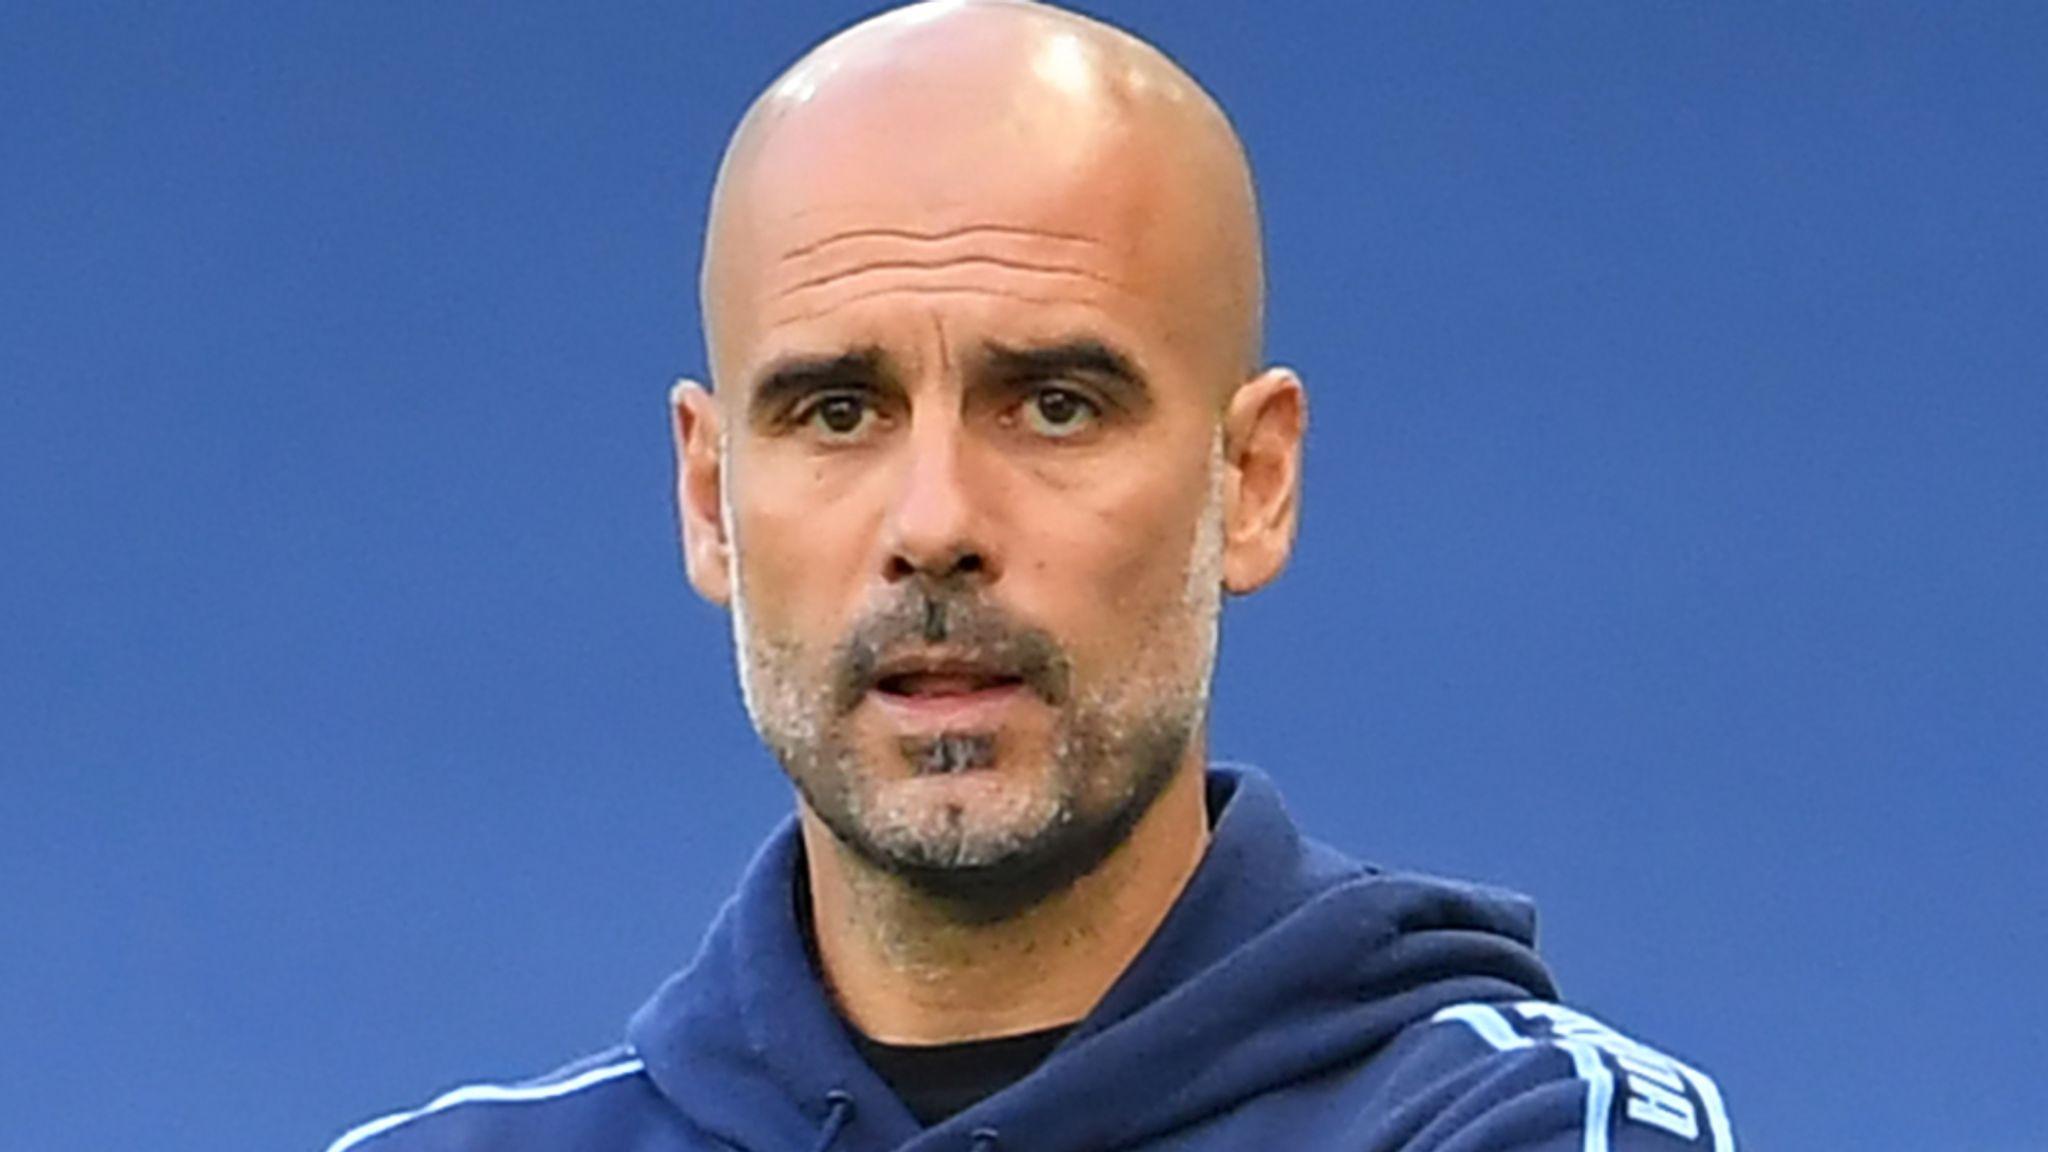 Manchester City vs Newcastle United team news, prediction, kick-off